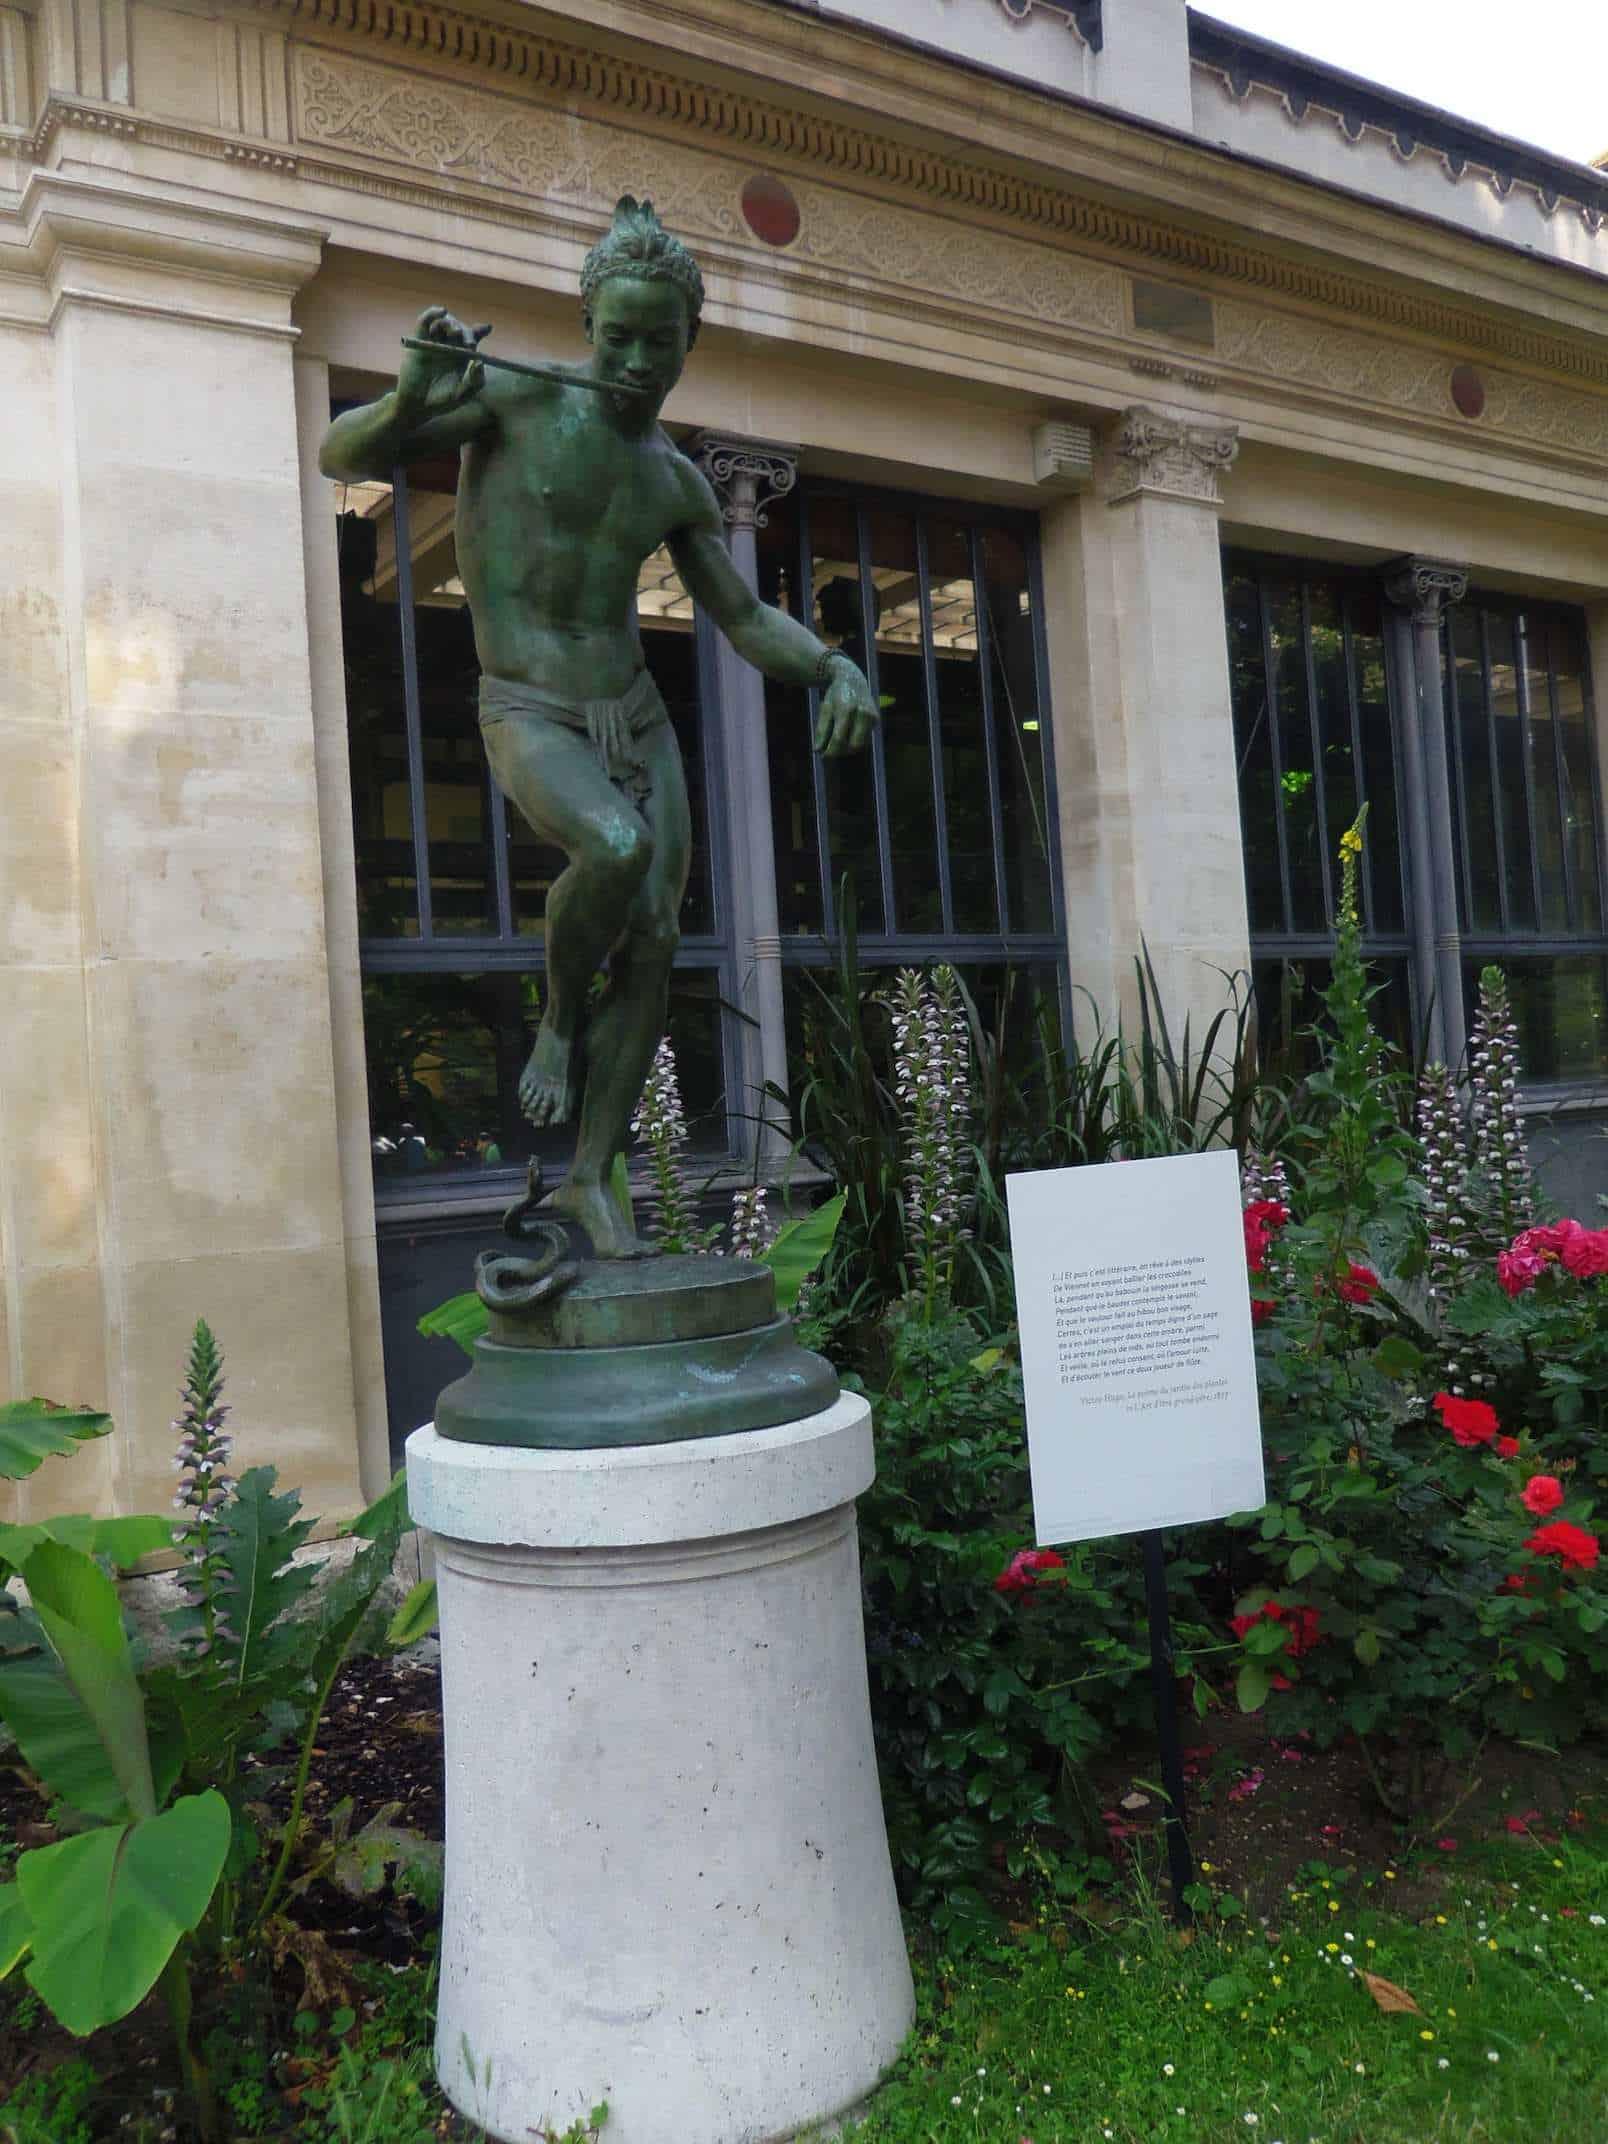 Ouderwetse dierentuin in de Jardin des Plantes (c) Srsck